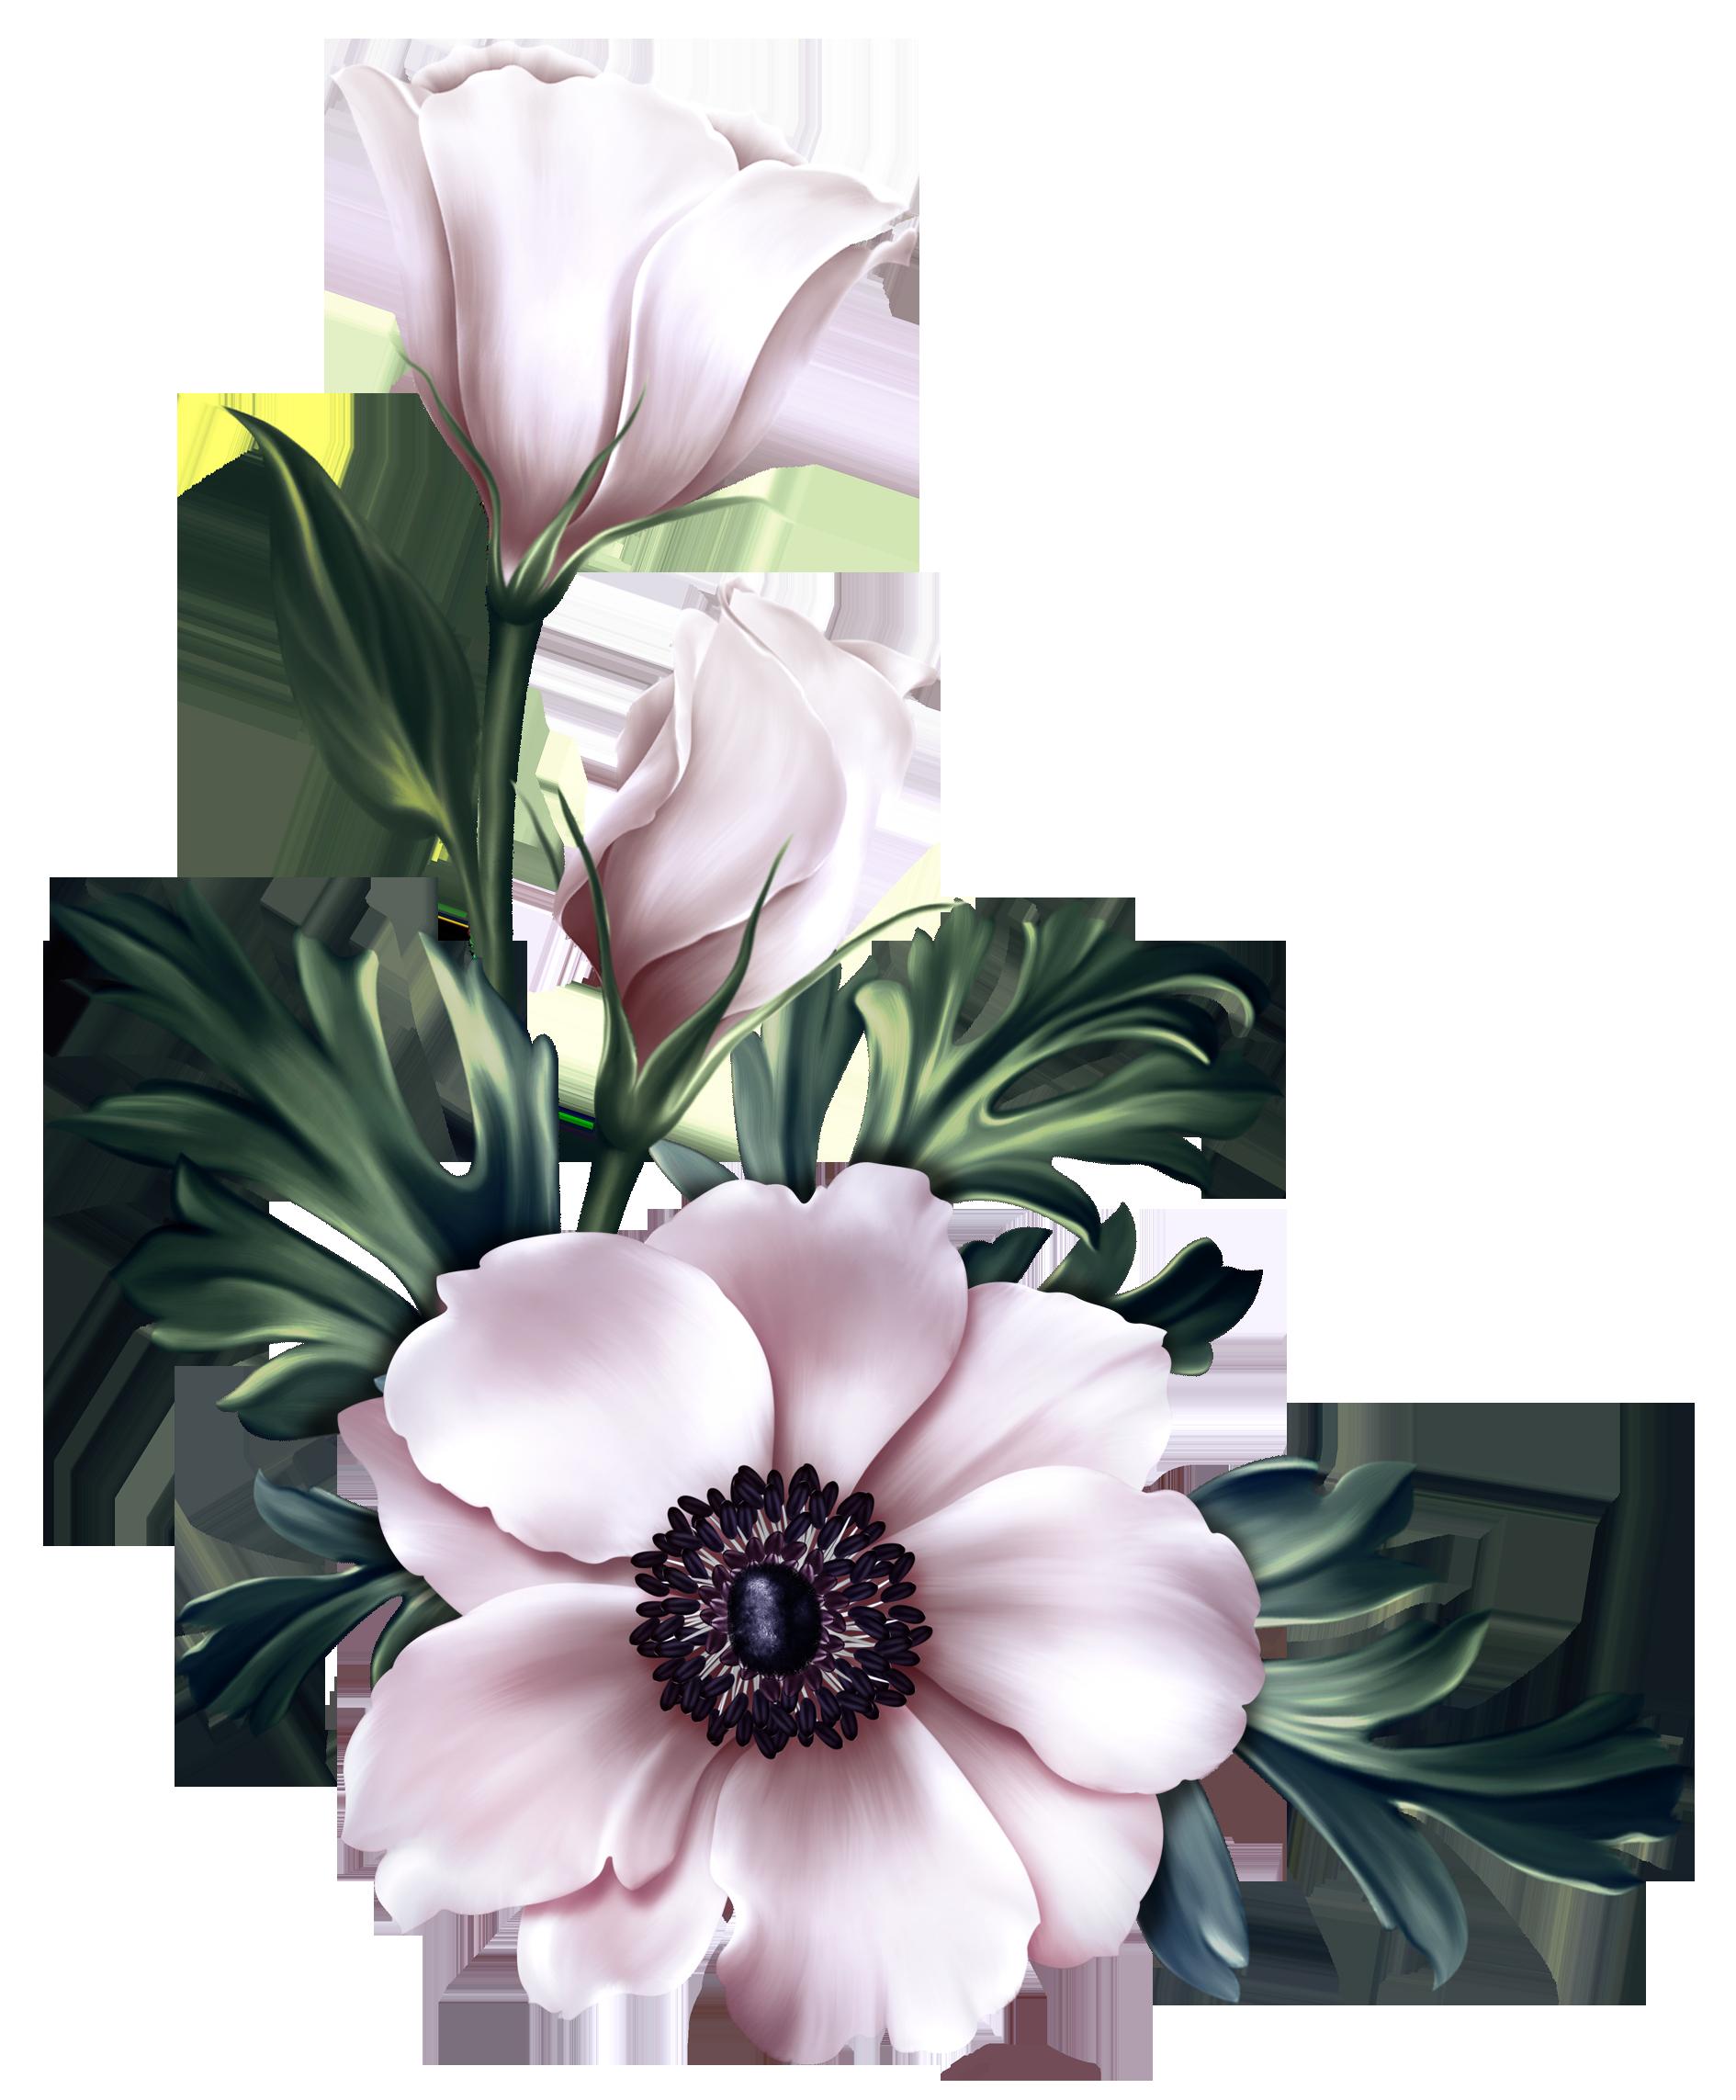 Pin By Jyoti Netam On Jaguar Women Flower Painting Botanical Flowers Flower Doodles